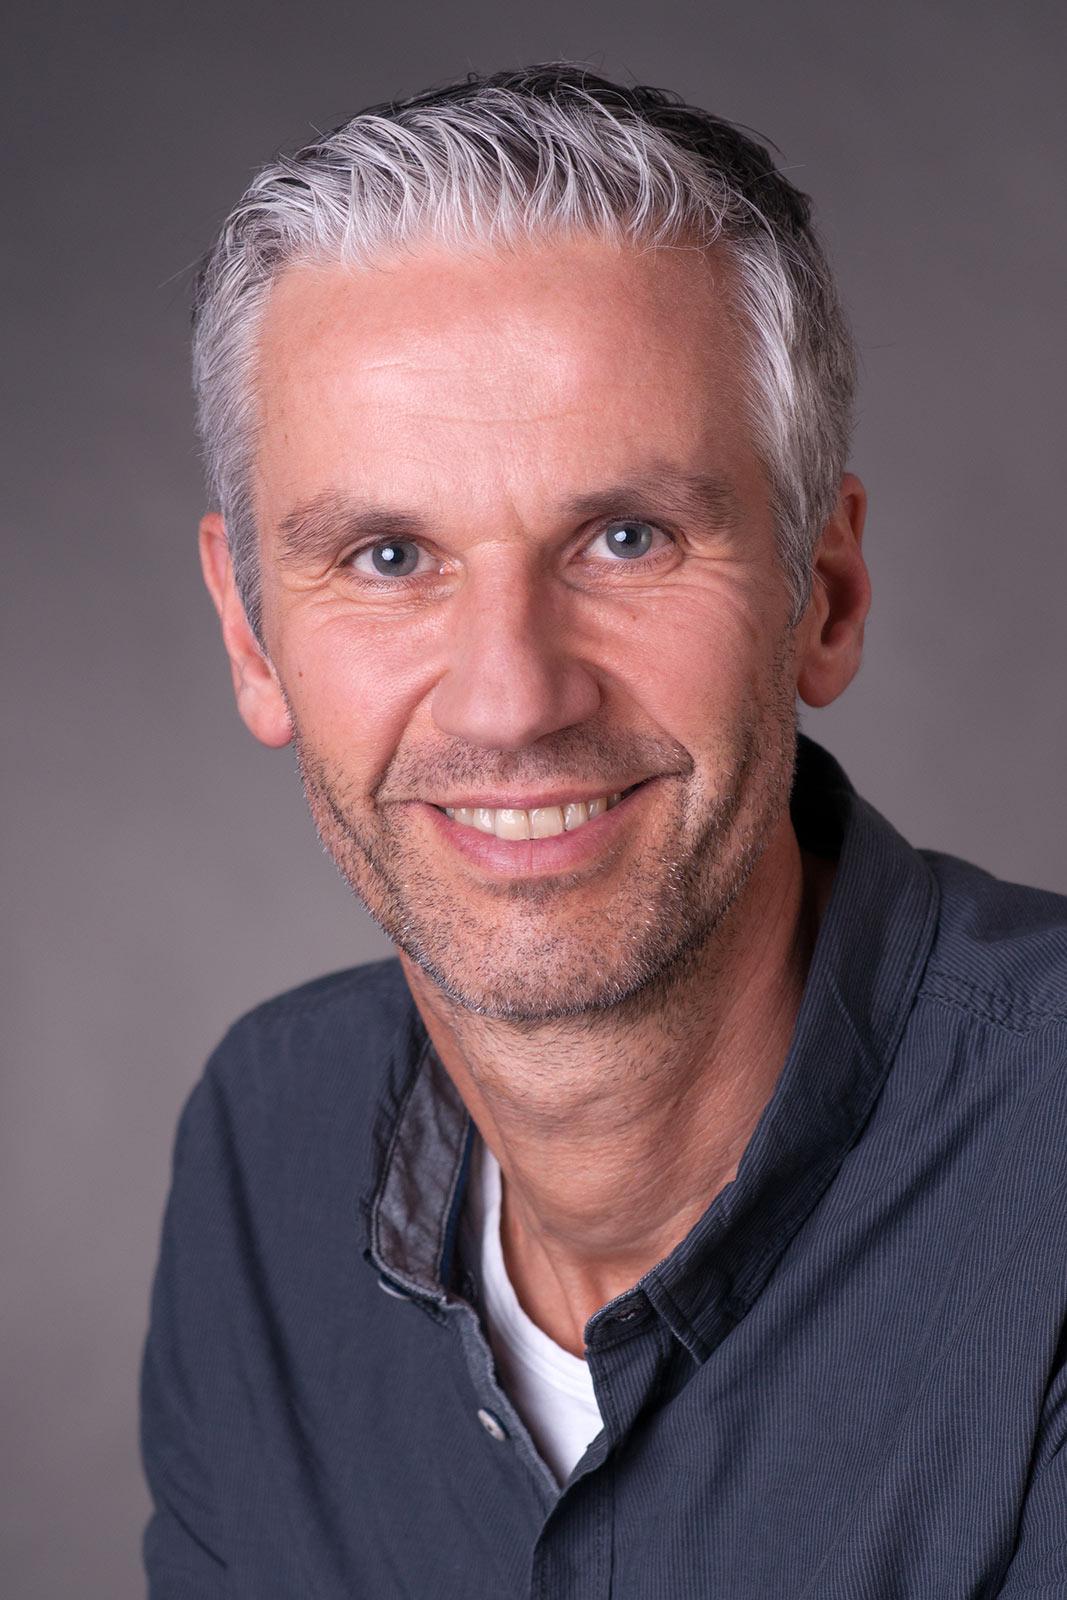 Florian Mohr - Reisebüro am Brunneck